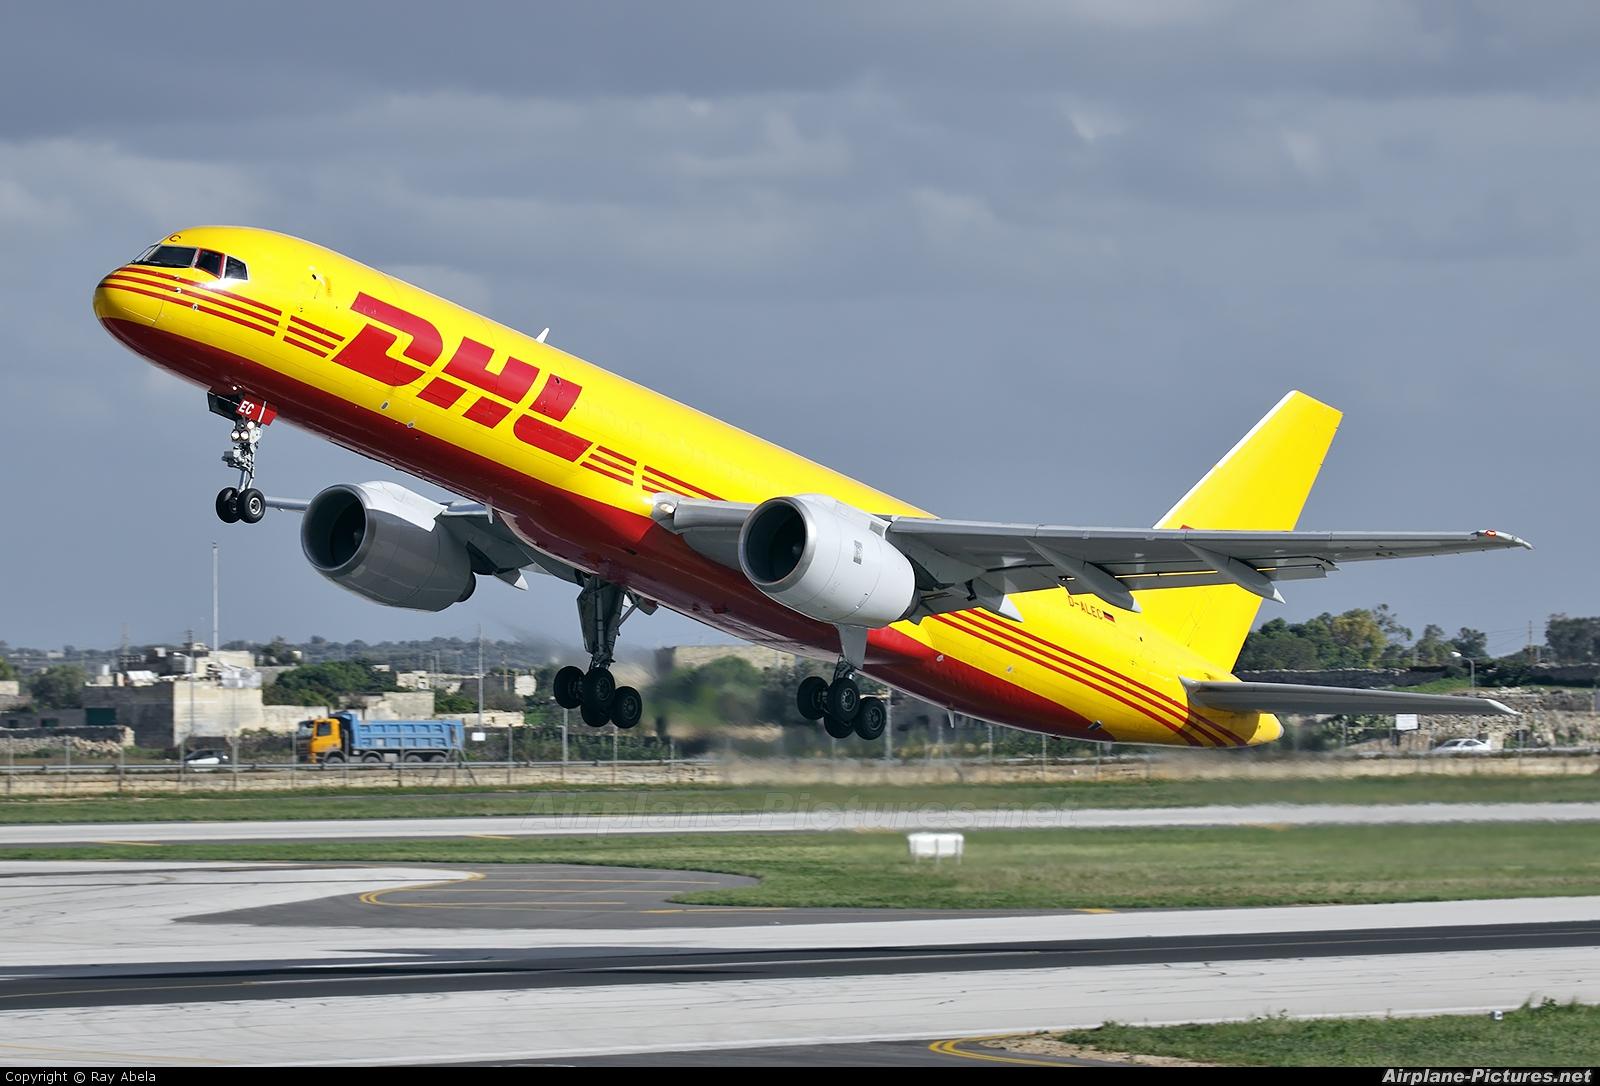 DHL国际快递 DHL燃油附加费 TNT燃油附加费 UPS燃油附加费 FedEx燃油附加费 TNT国际快递 UPS国际快递 燃油附加费 国际快递